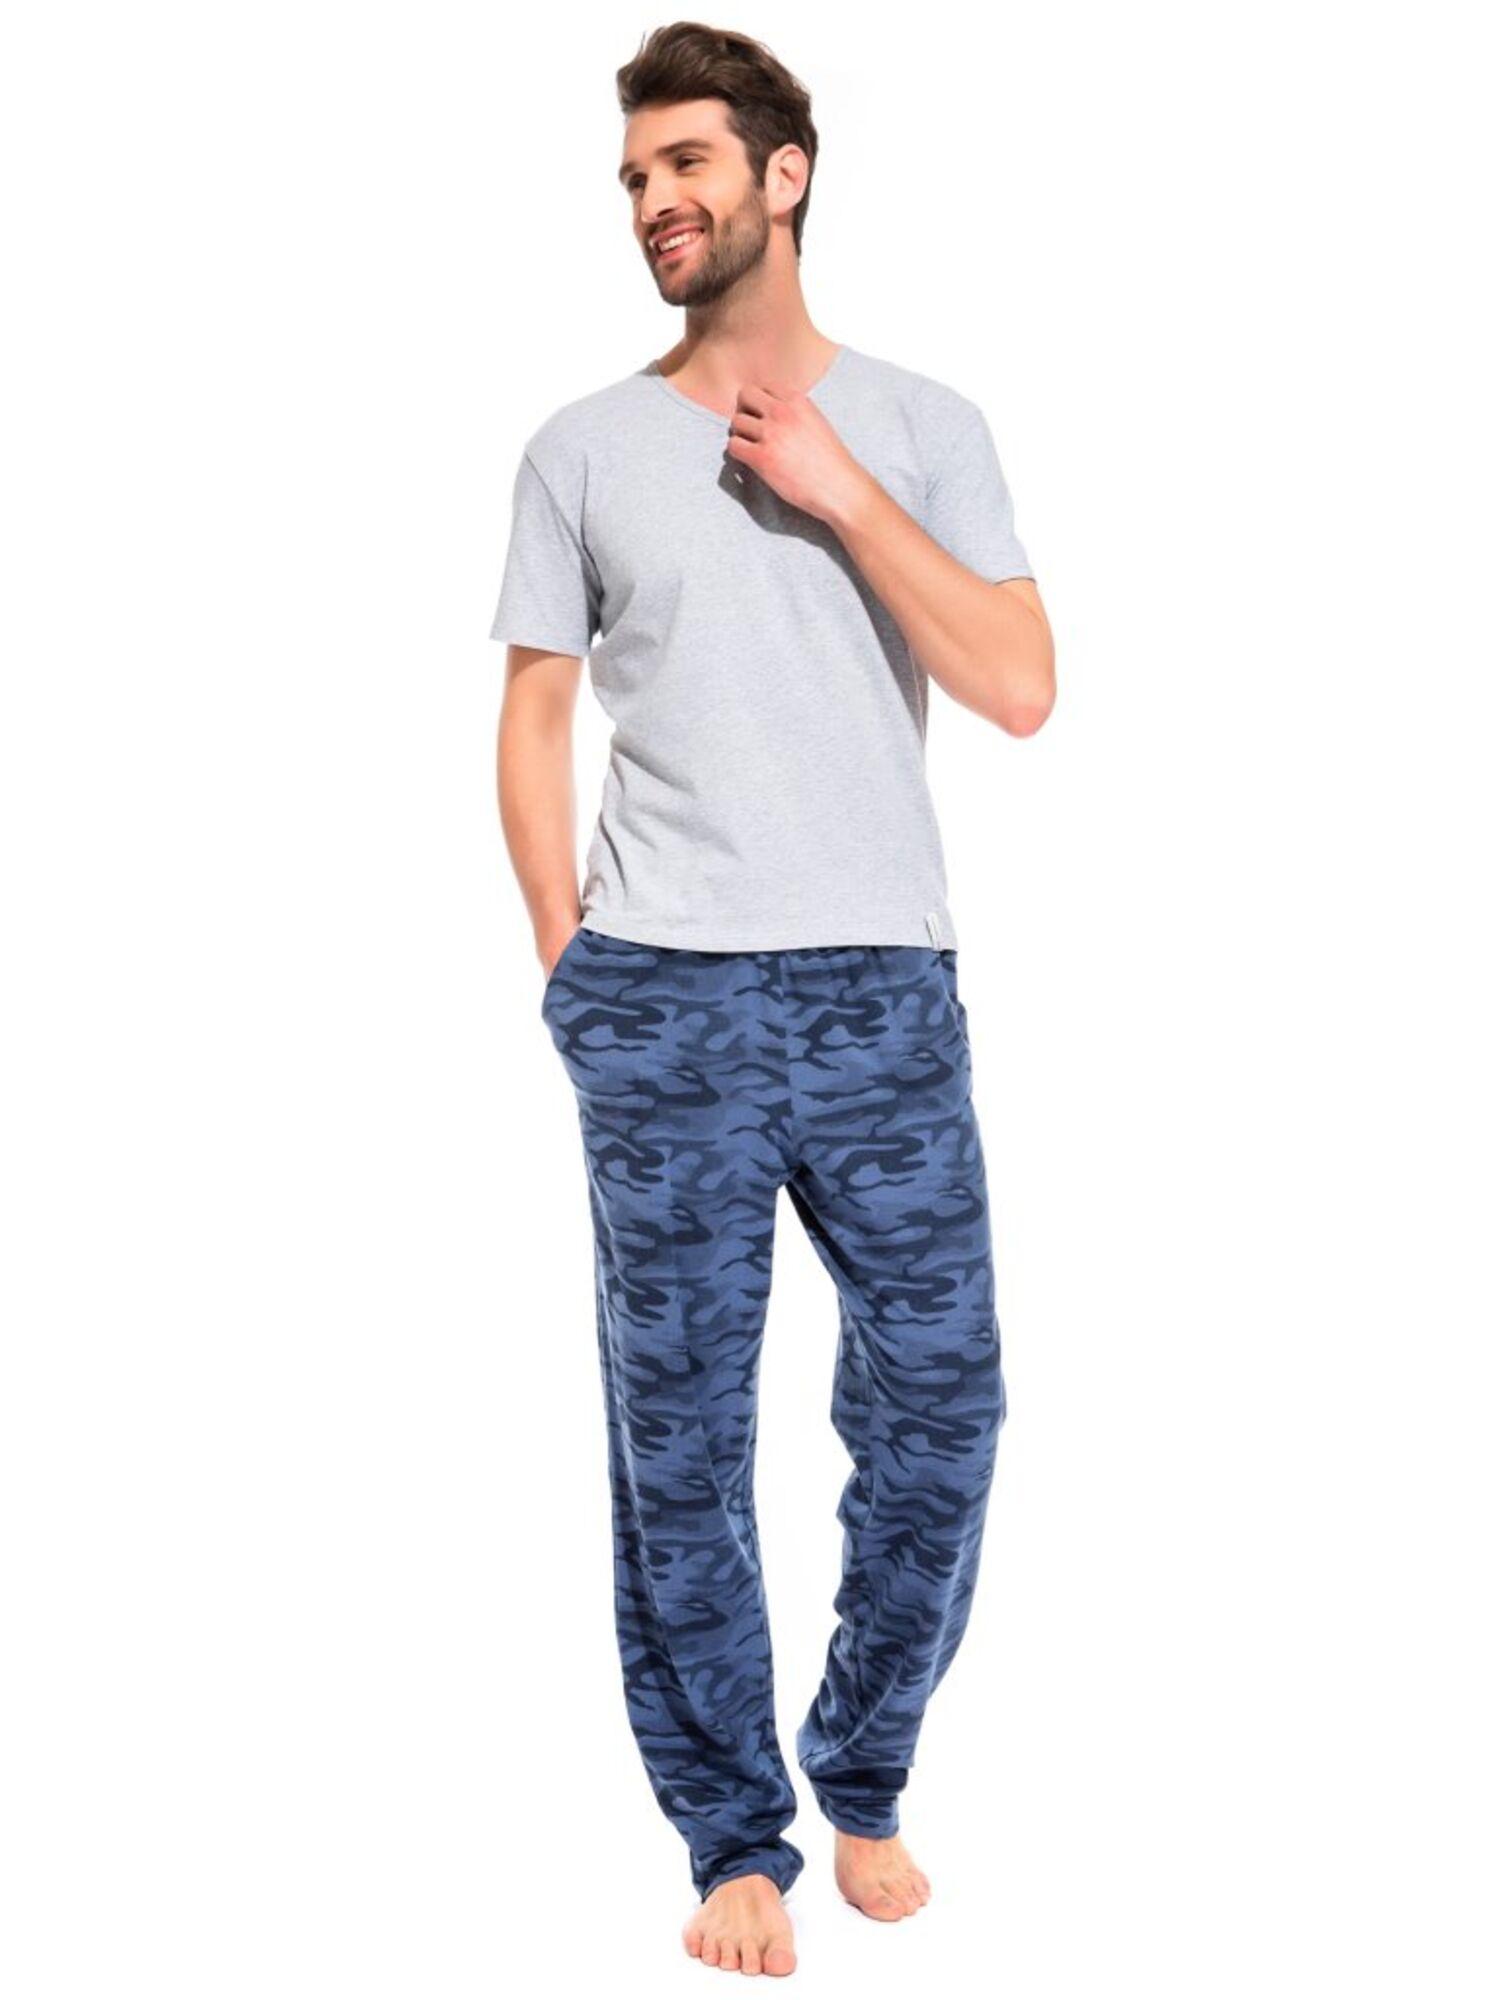 Легкие трикотажные брюки Marine Militaire 042 синий